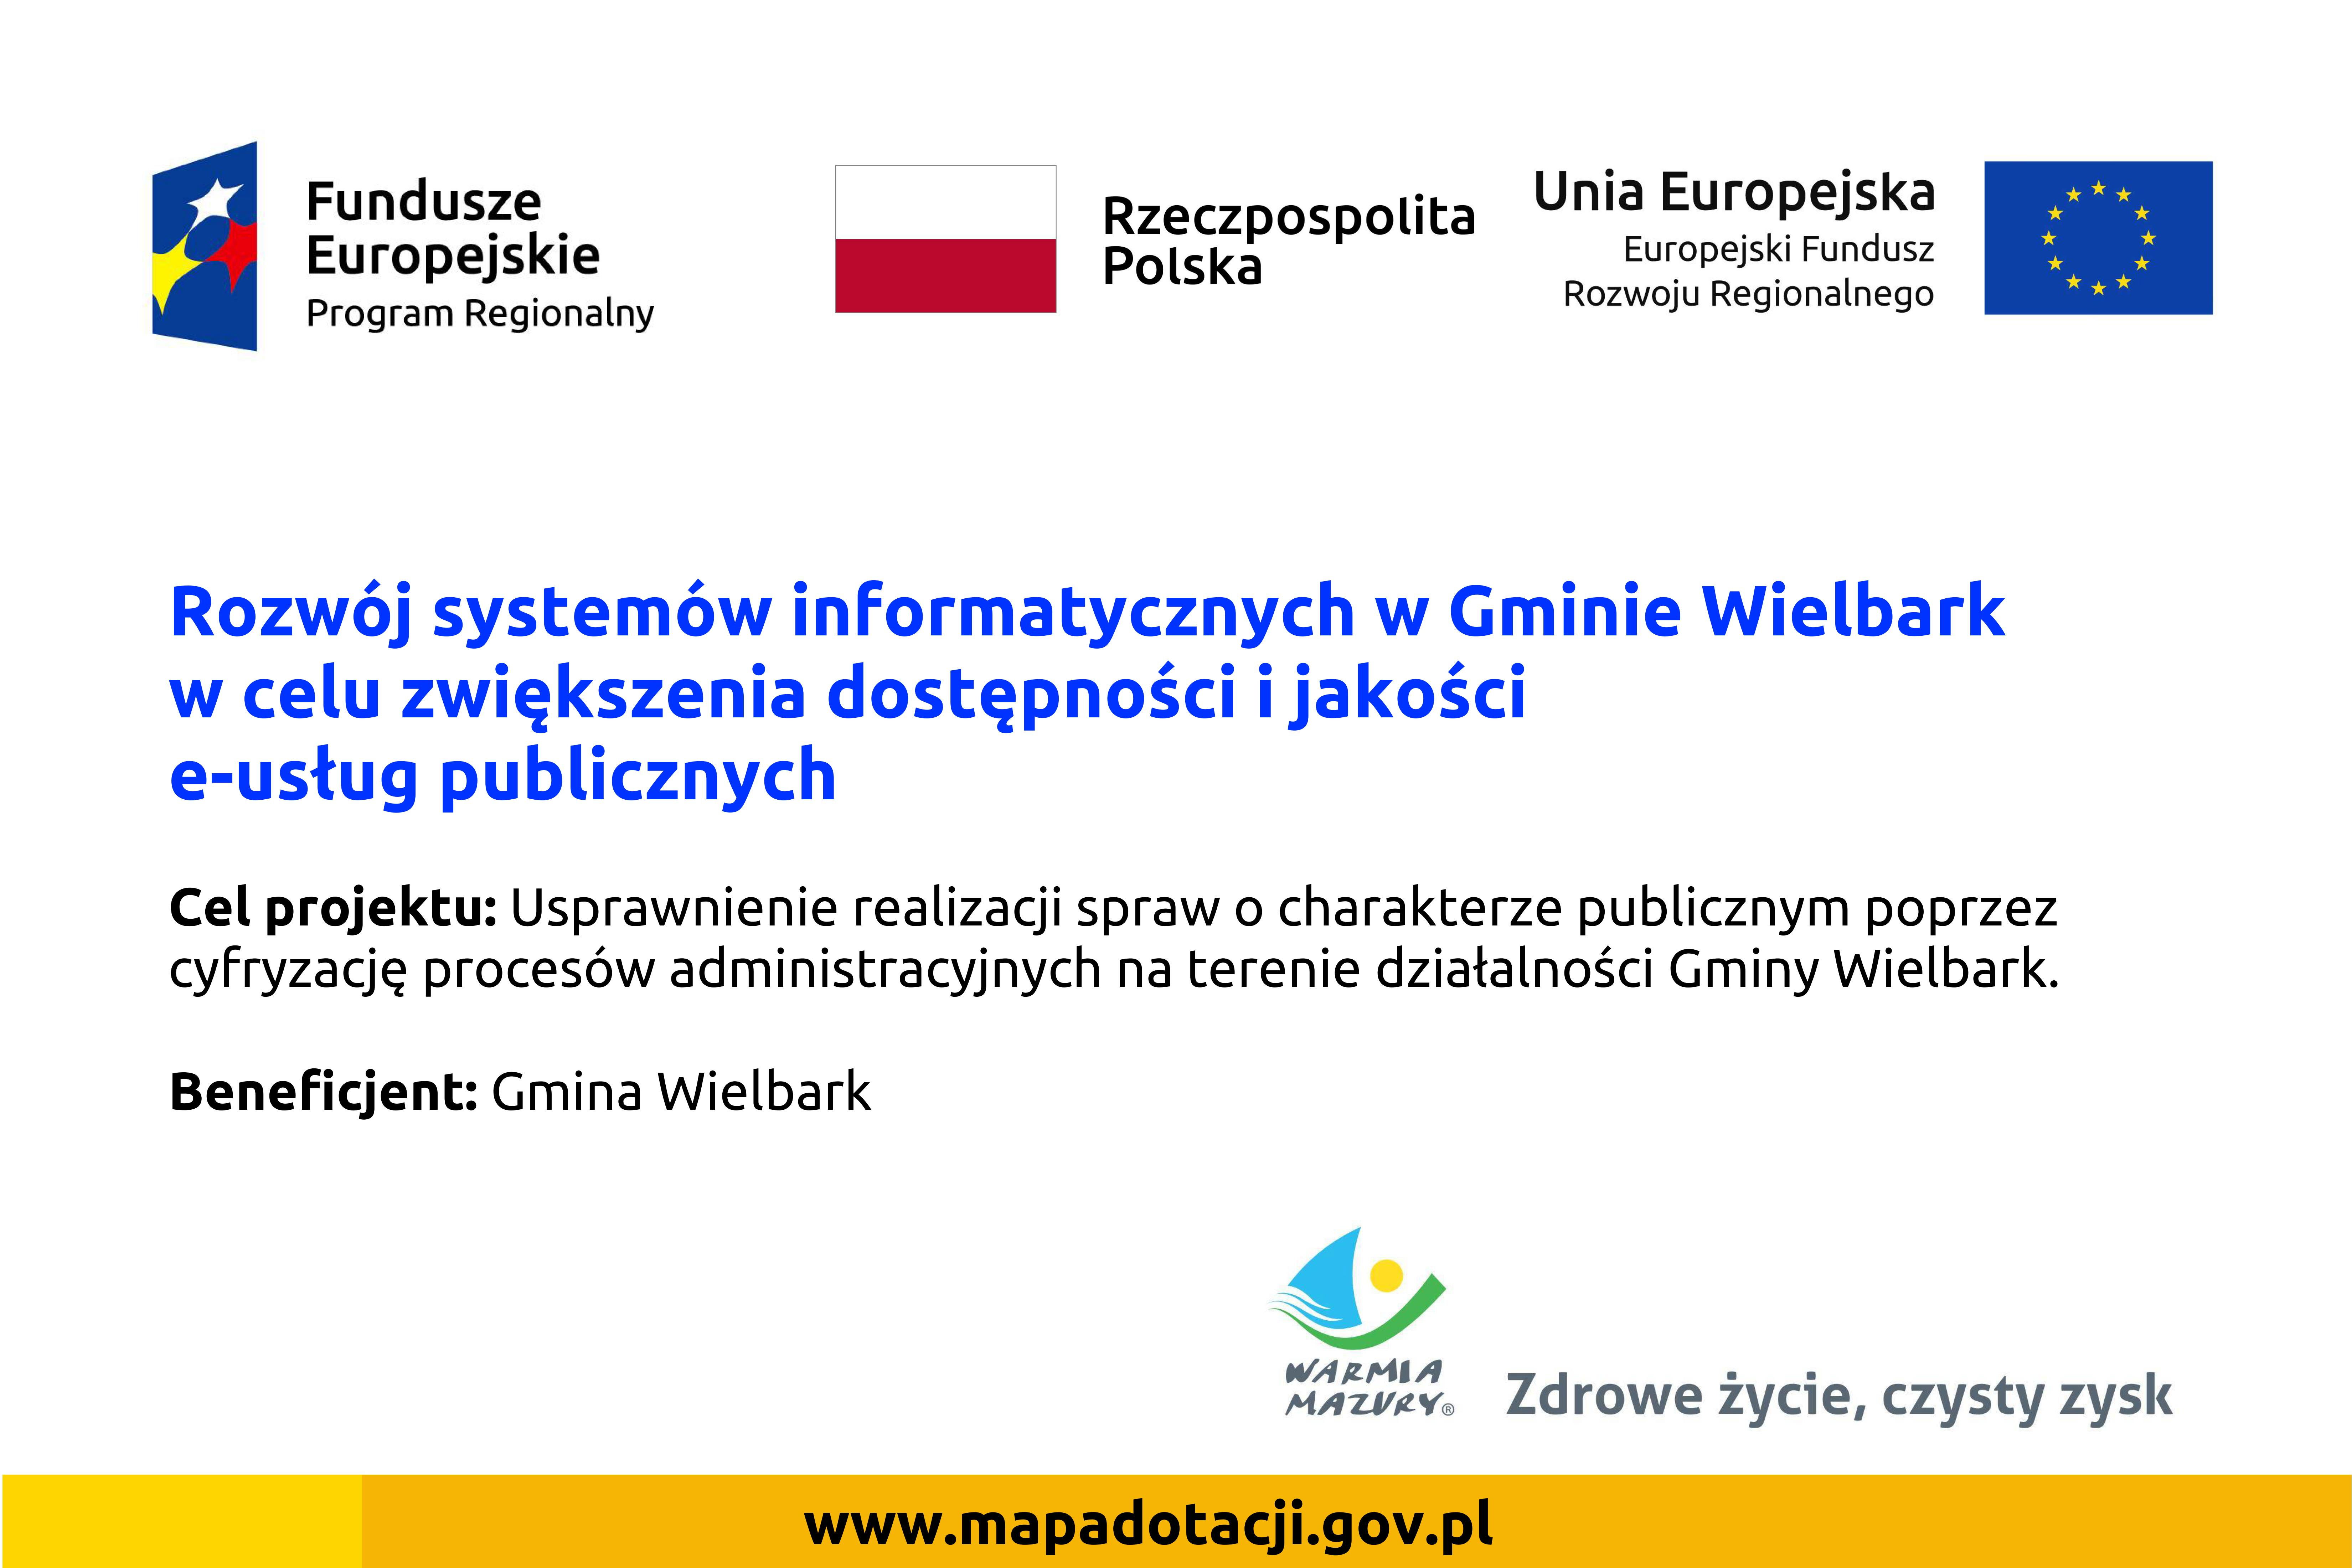 https://m.powiatszczycienski.pl/2019/10/orig/tablica-rpo-e-uslugi-01-25357.jpg